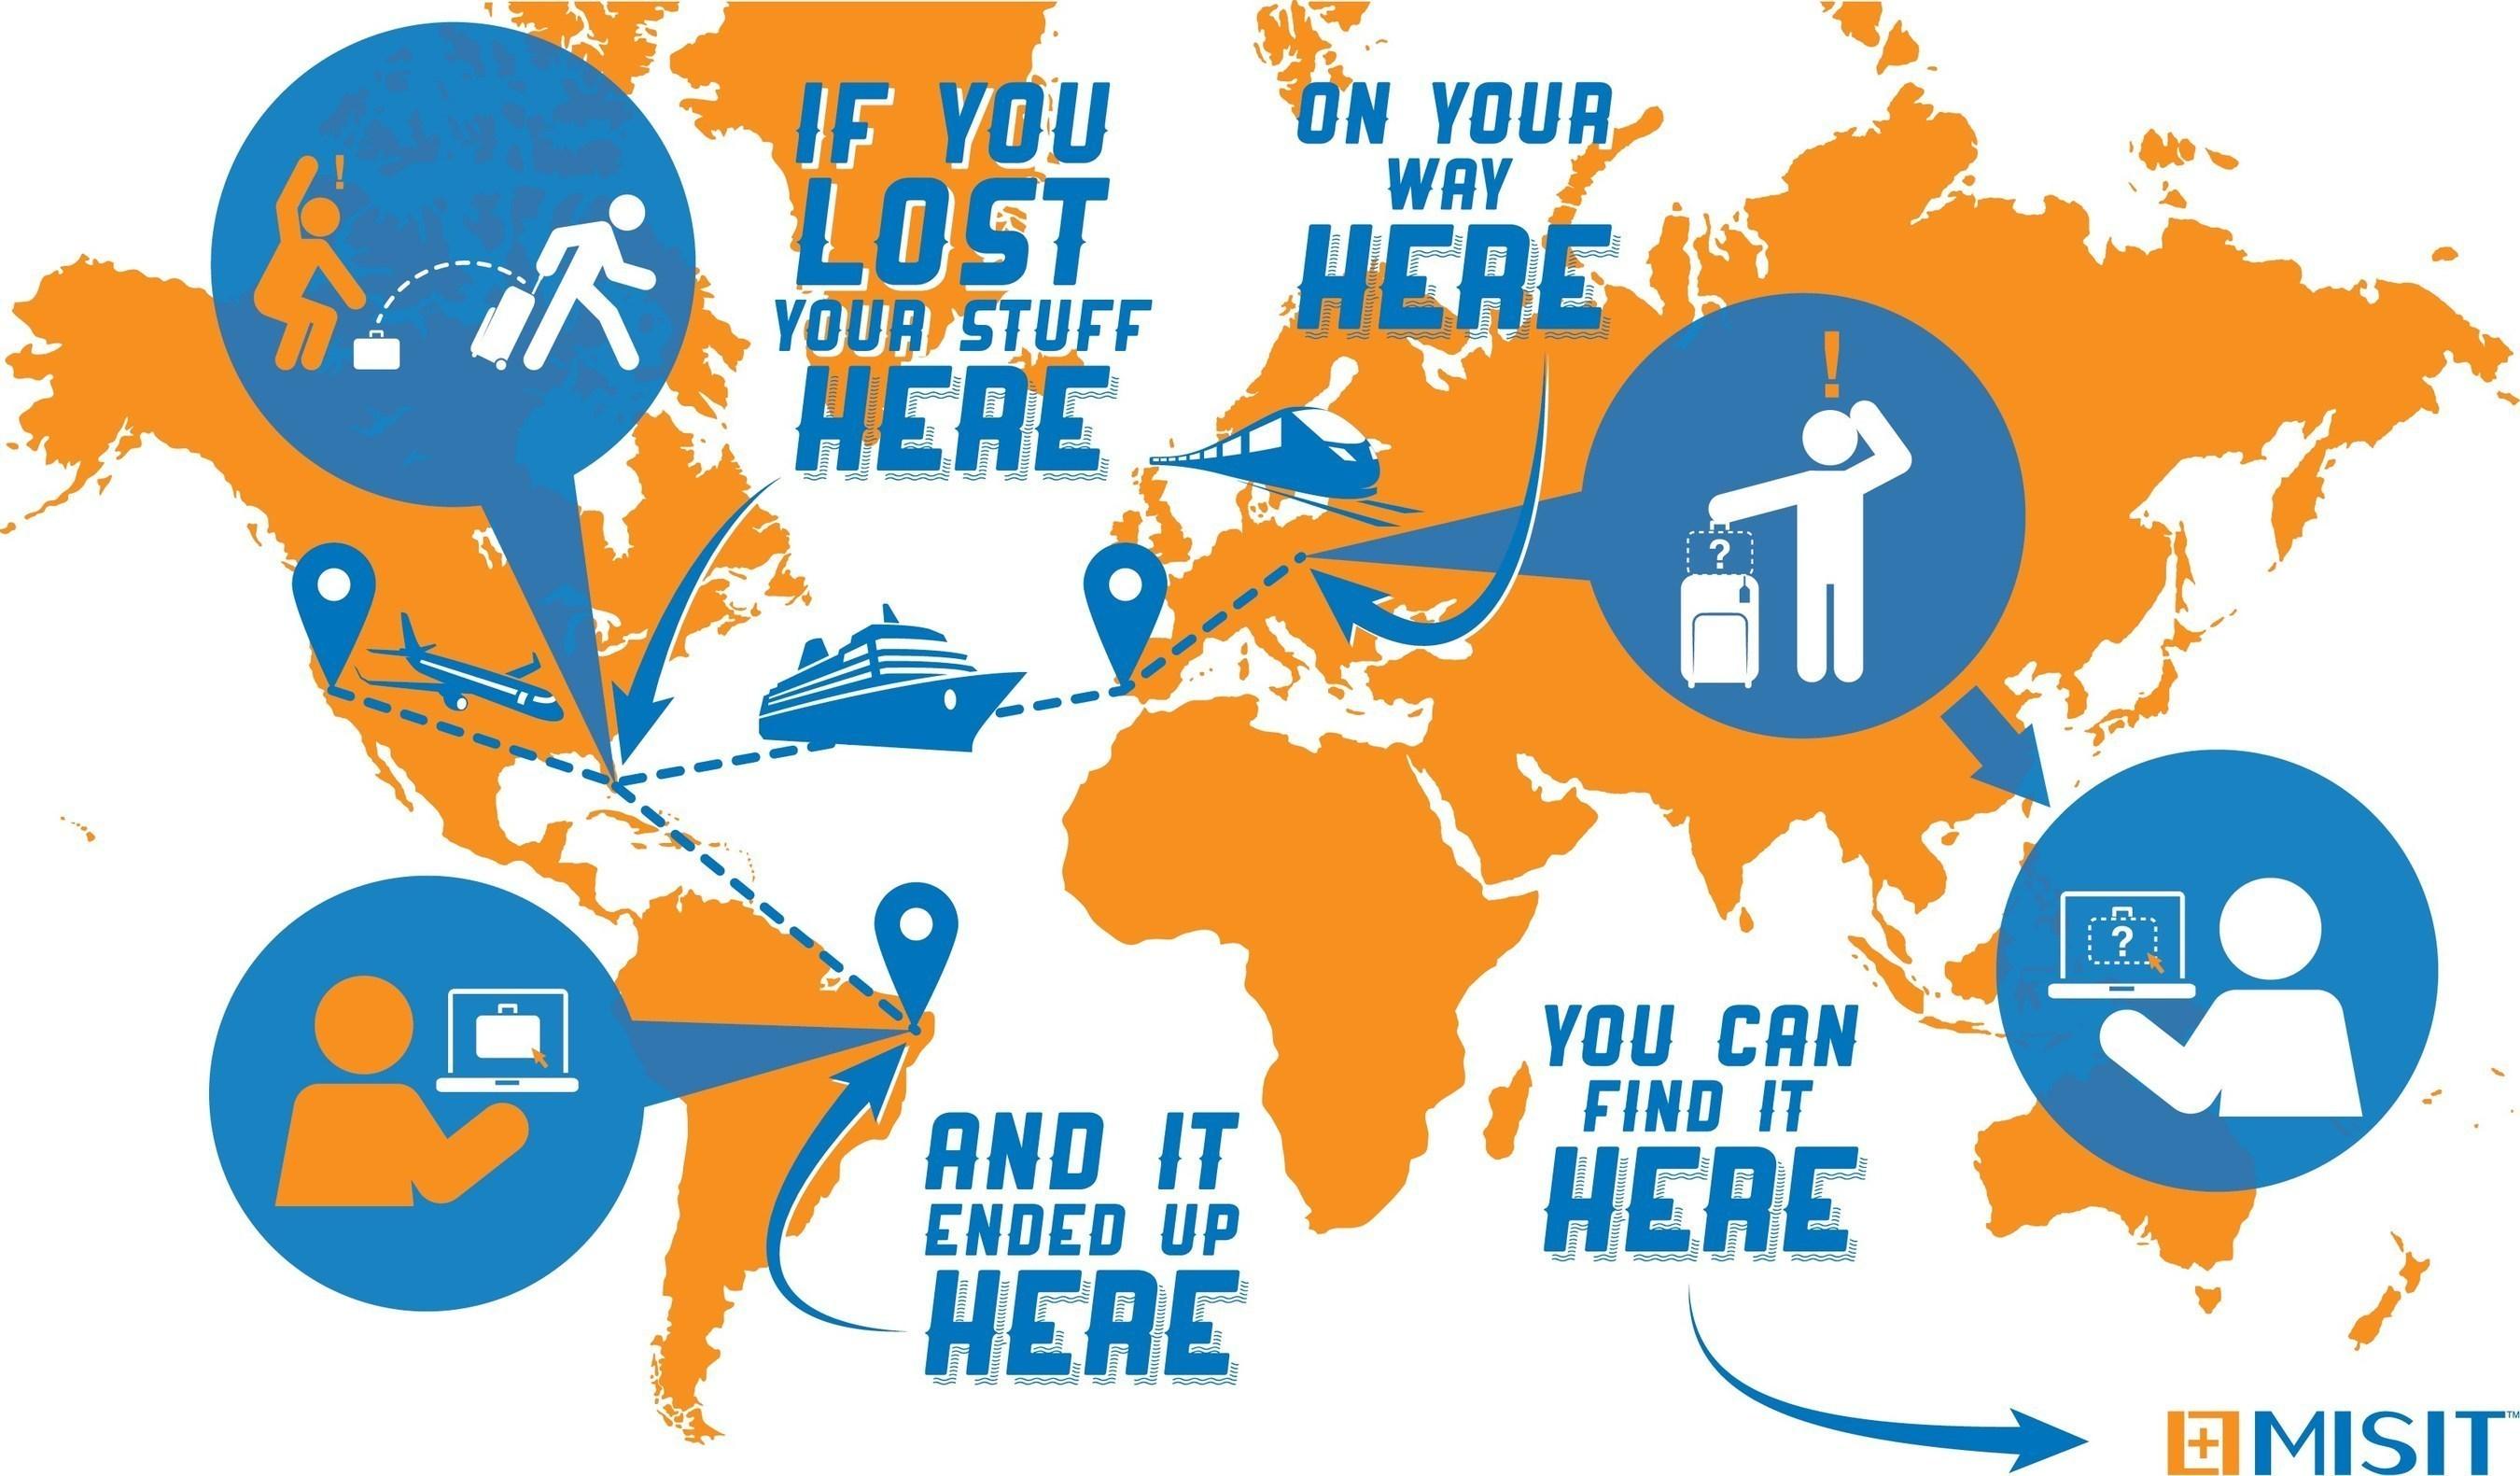 MISIT - misit.travel